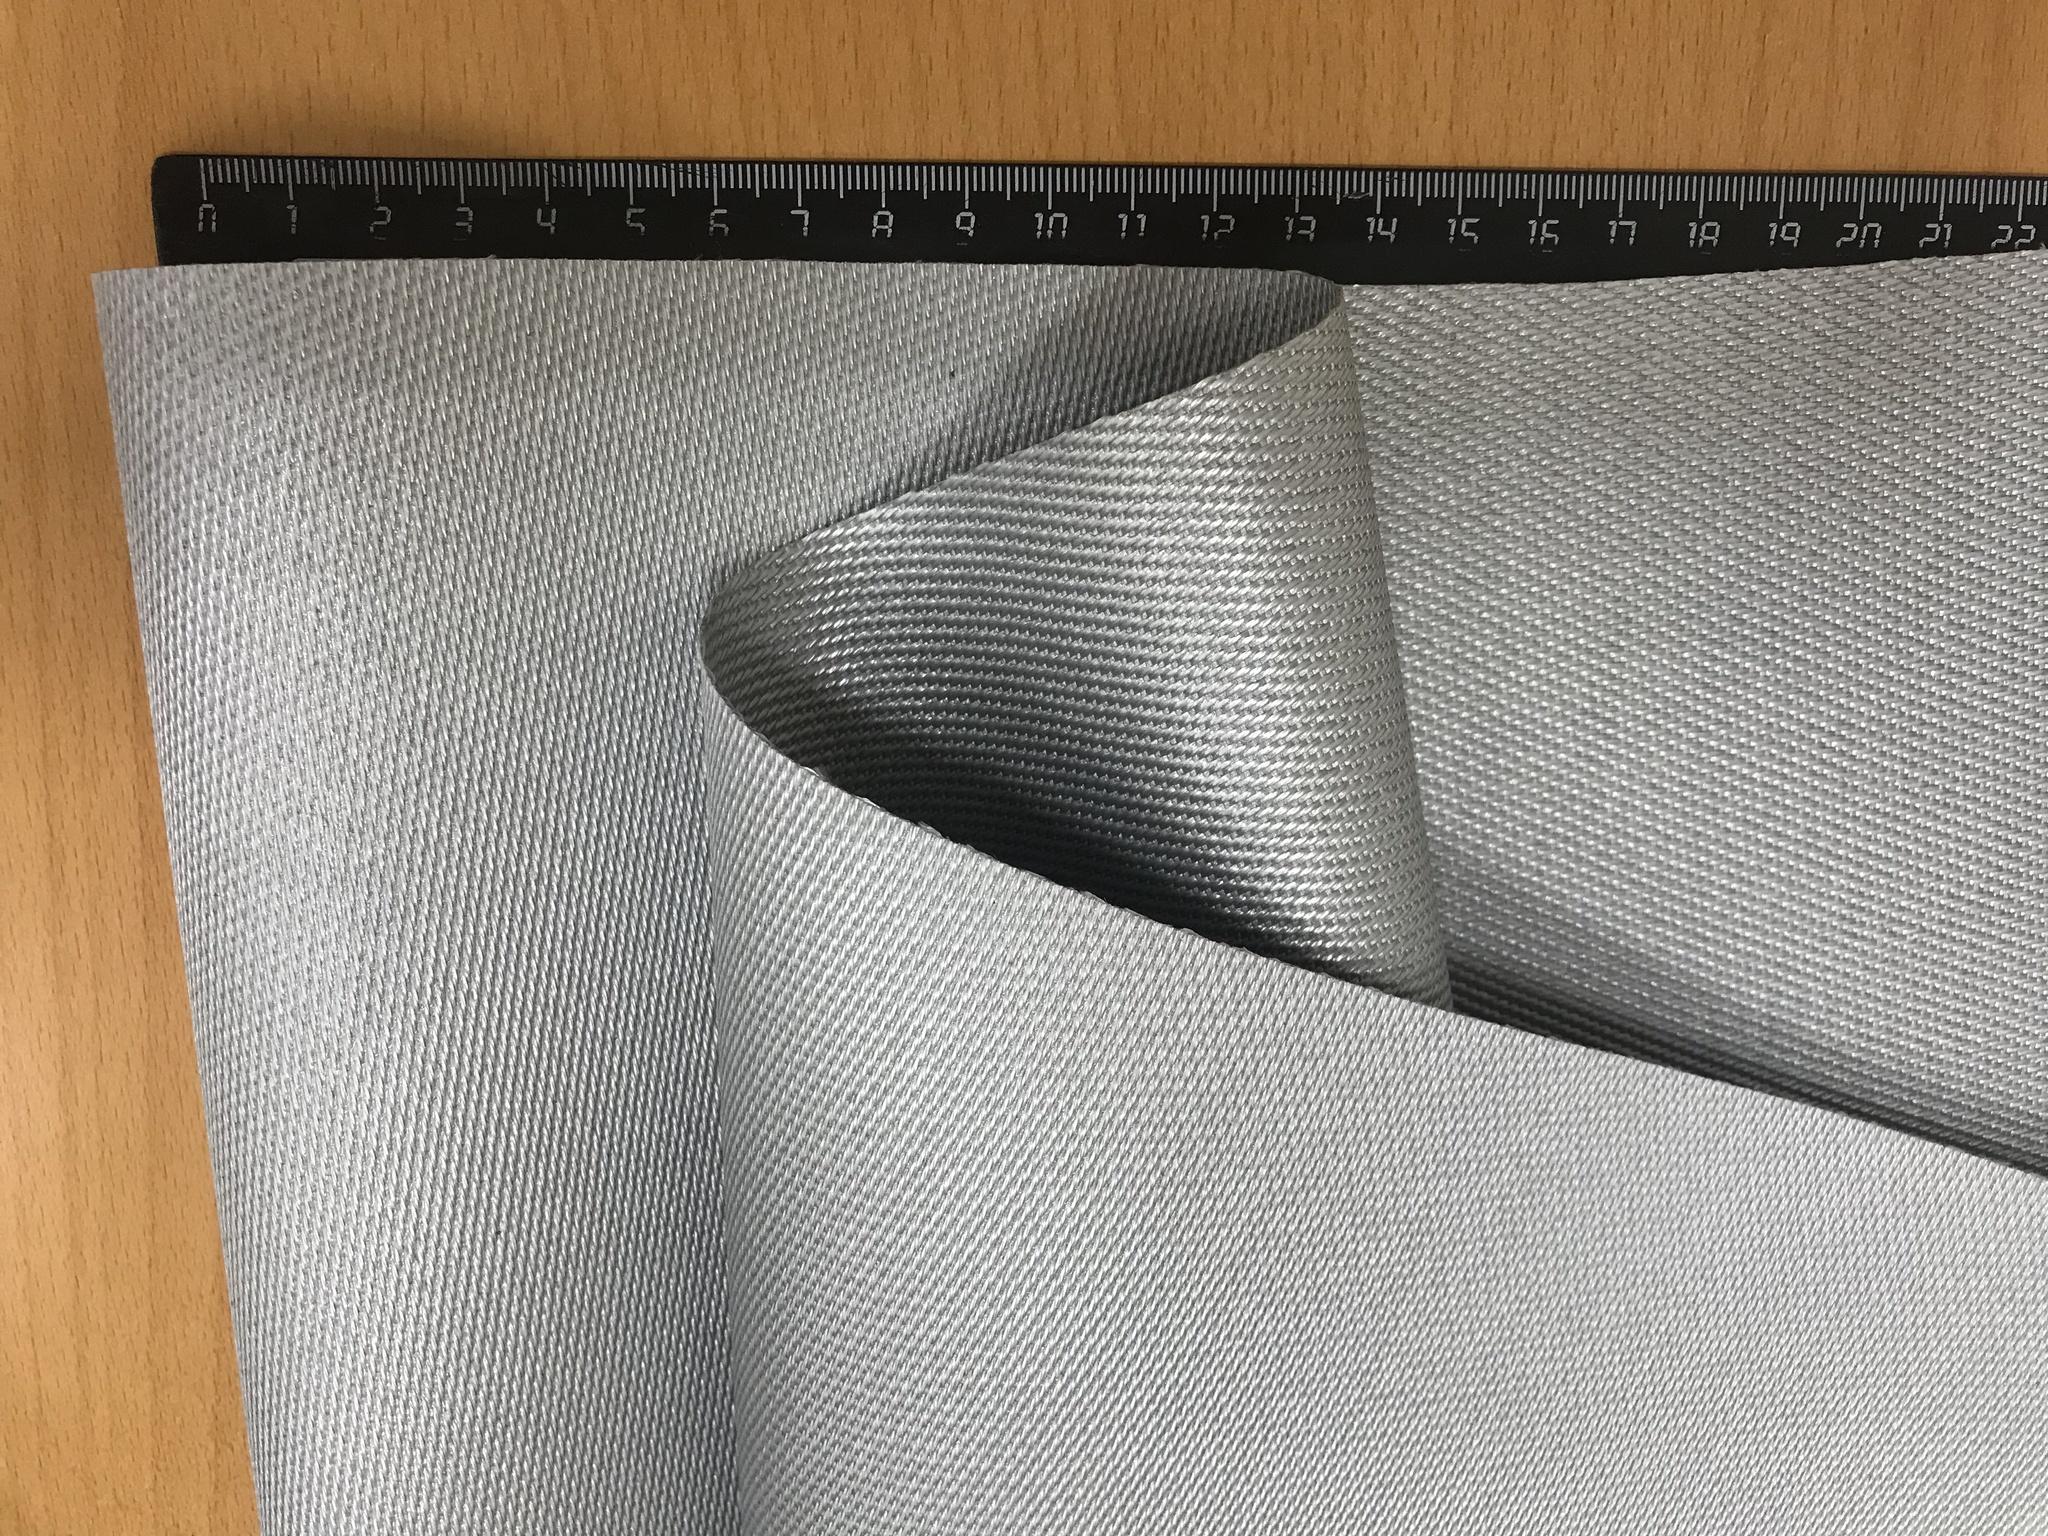 Кремнеземная ткань КТ-11 с ПУ покрытием двусторонняя